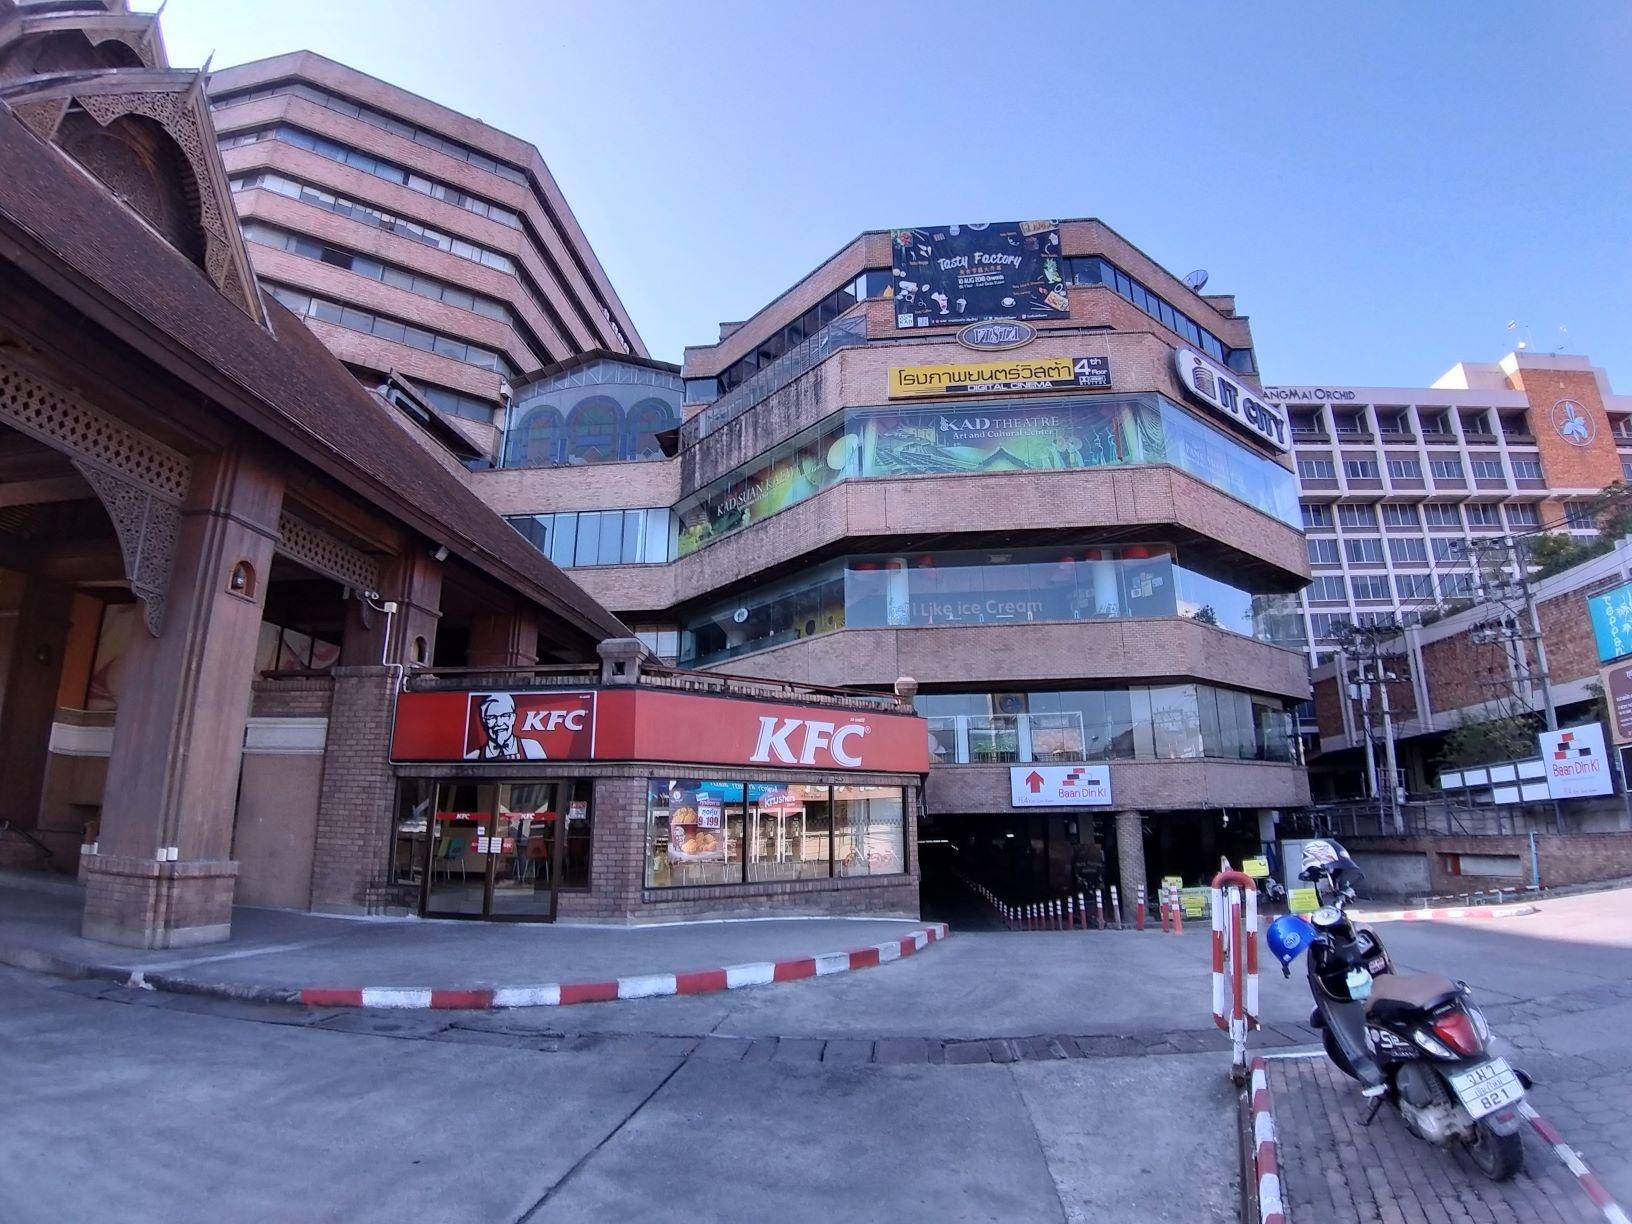 Chiang Mai, Thai Lan mua le hoi lung linh - Yee Peng va Loy Krathong hinh anh 9